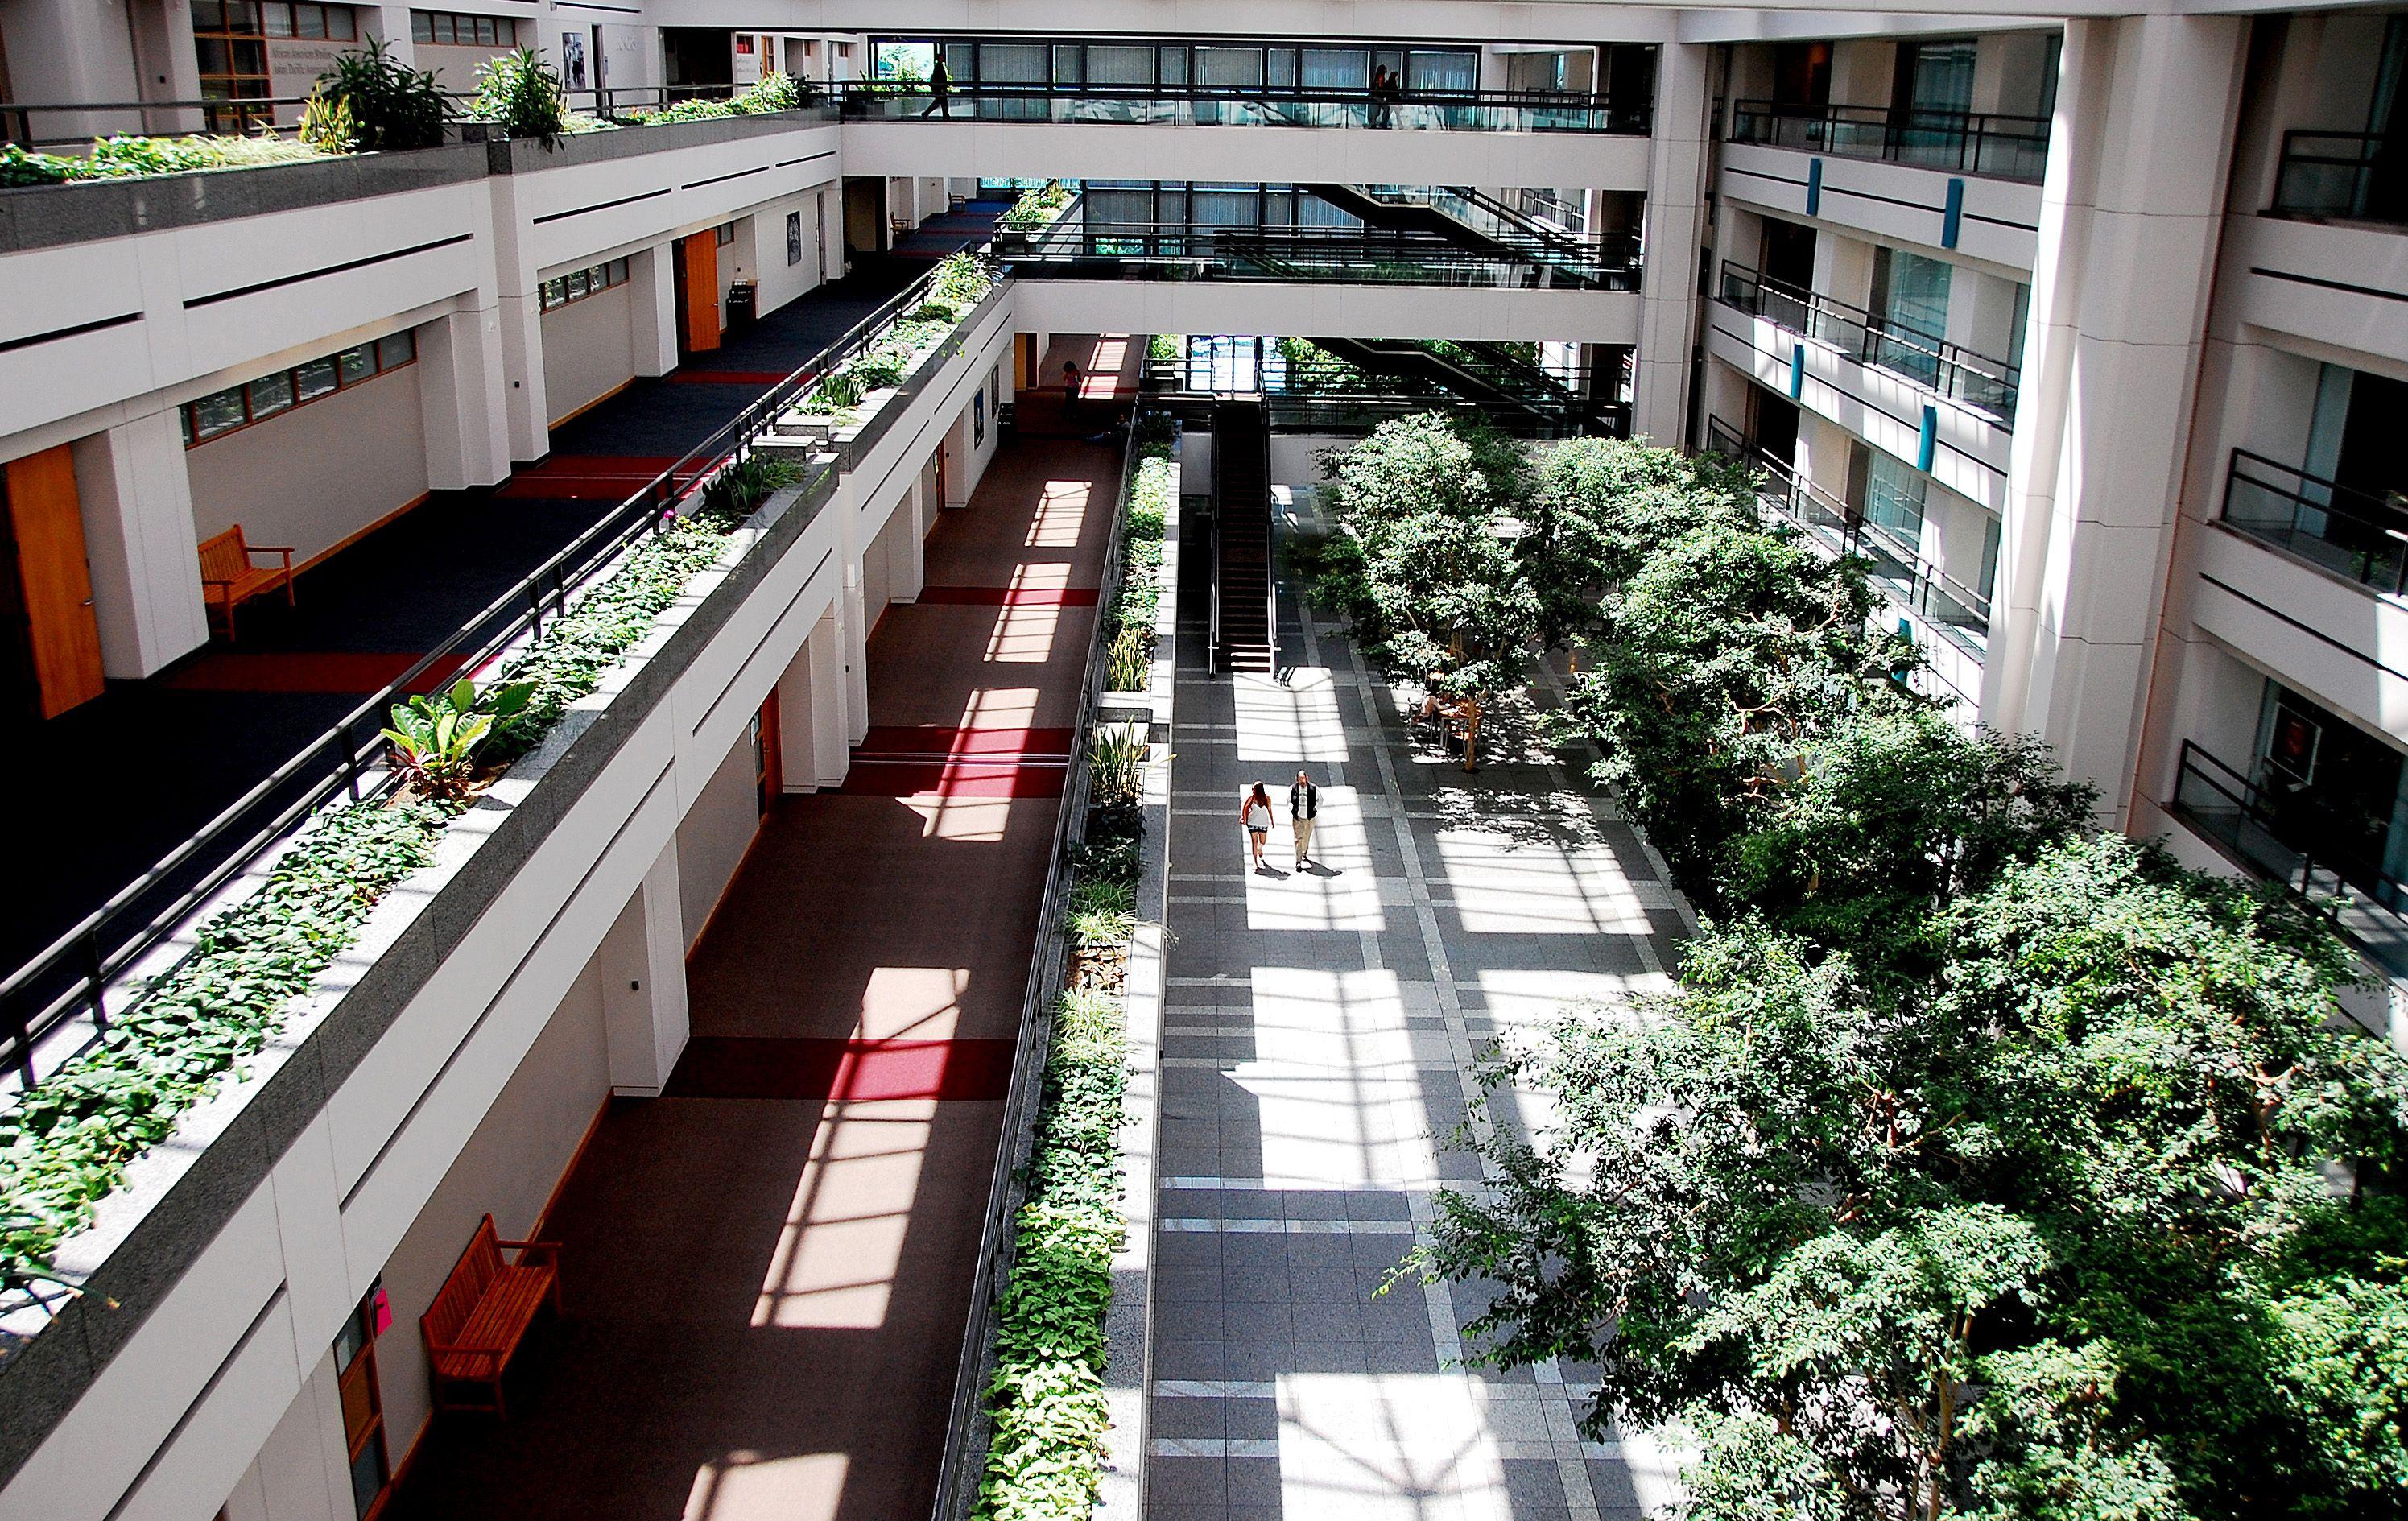 1999 University Hall Is Purchased And Opens The Following Year University Hall Loyola Marymount University University